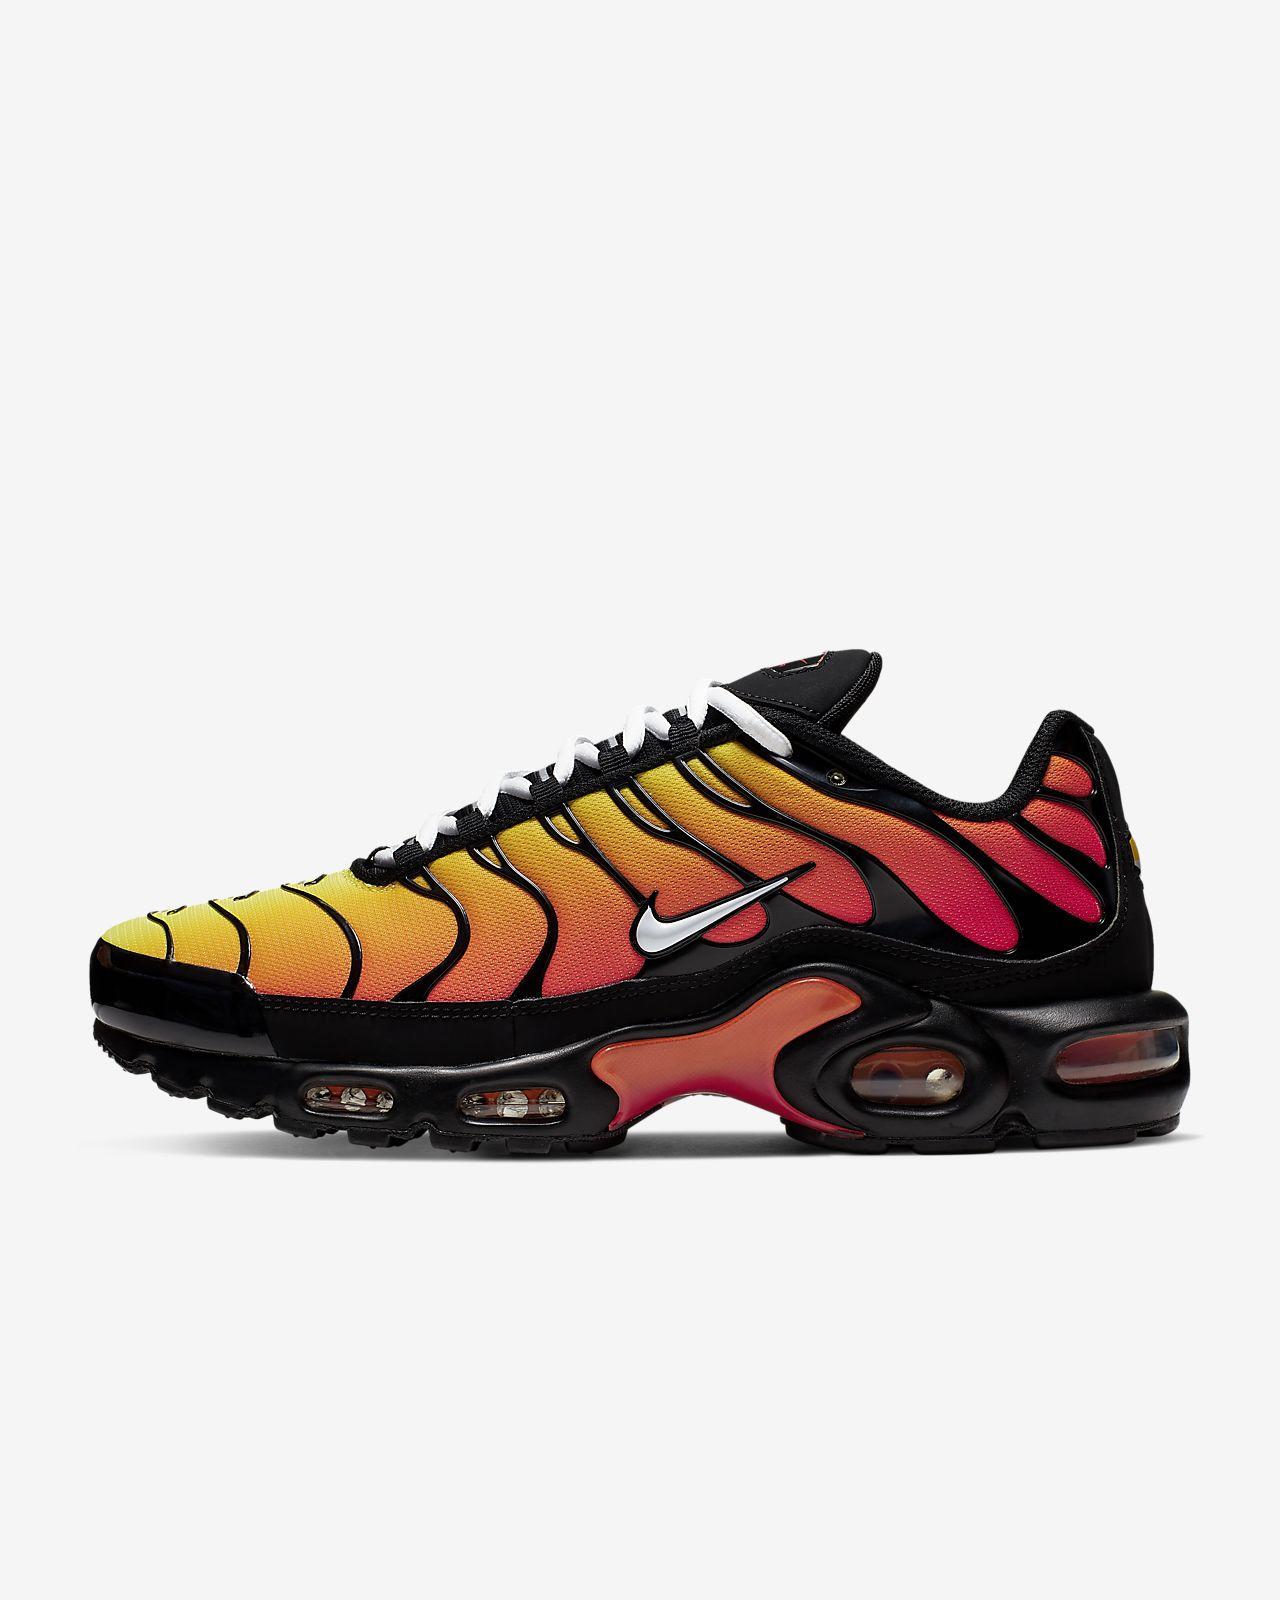 Nike Air Max Plus férficipő